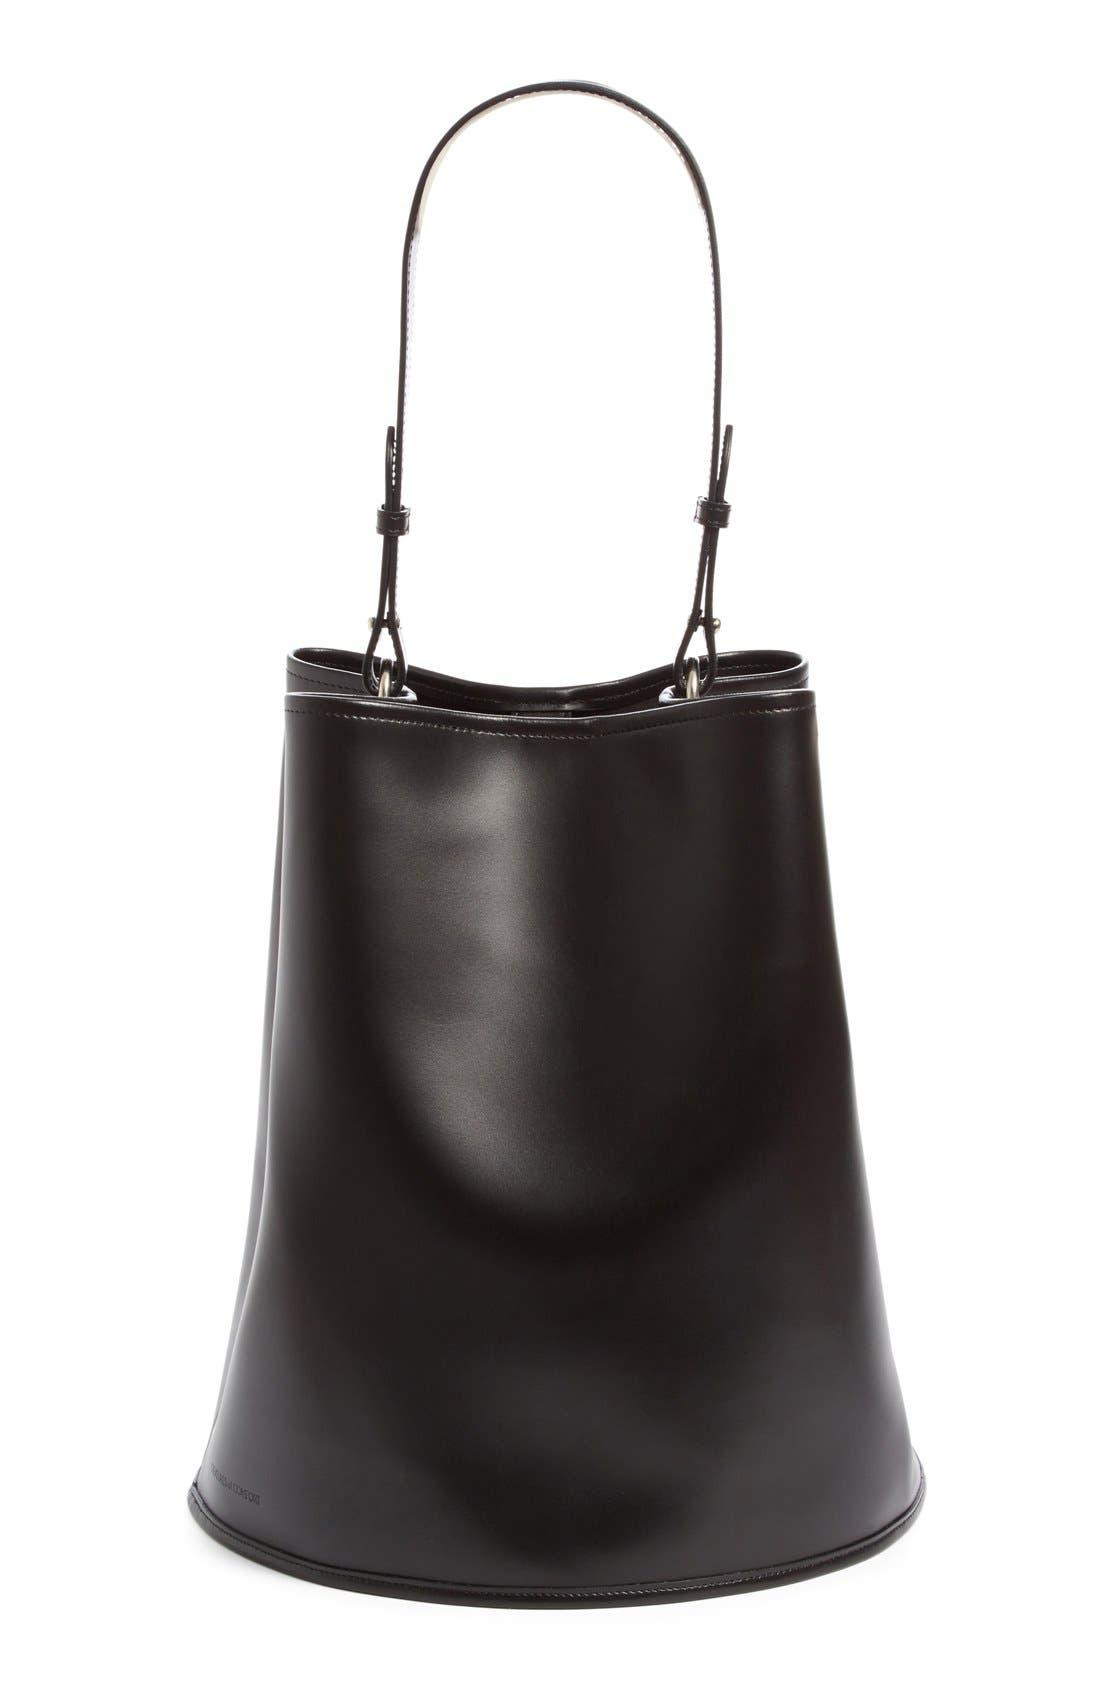 Creatures of Comfort Large Calfskin Leather Bucket Bag